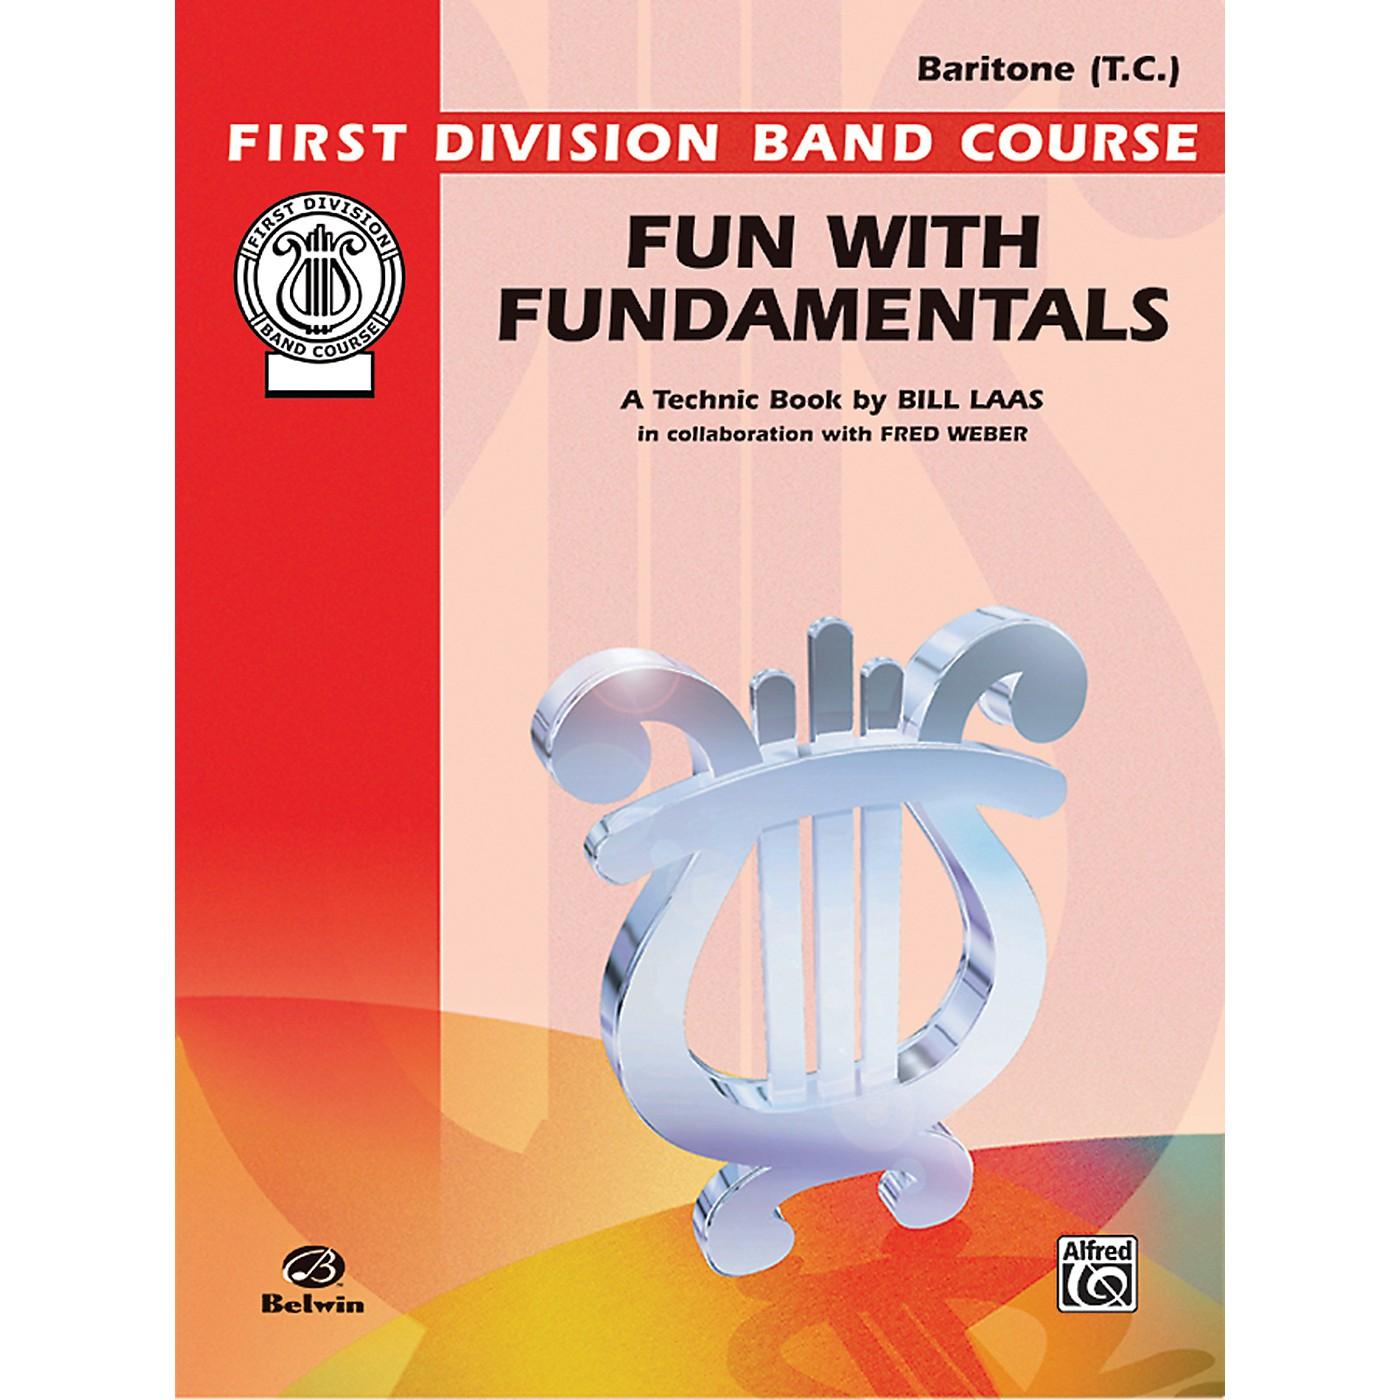 Alfred Fun with Fundamentals Baritone (T.C.) Book thumbnail